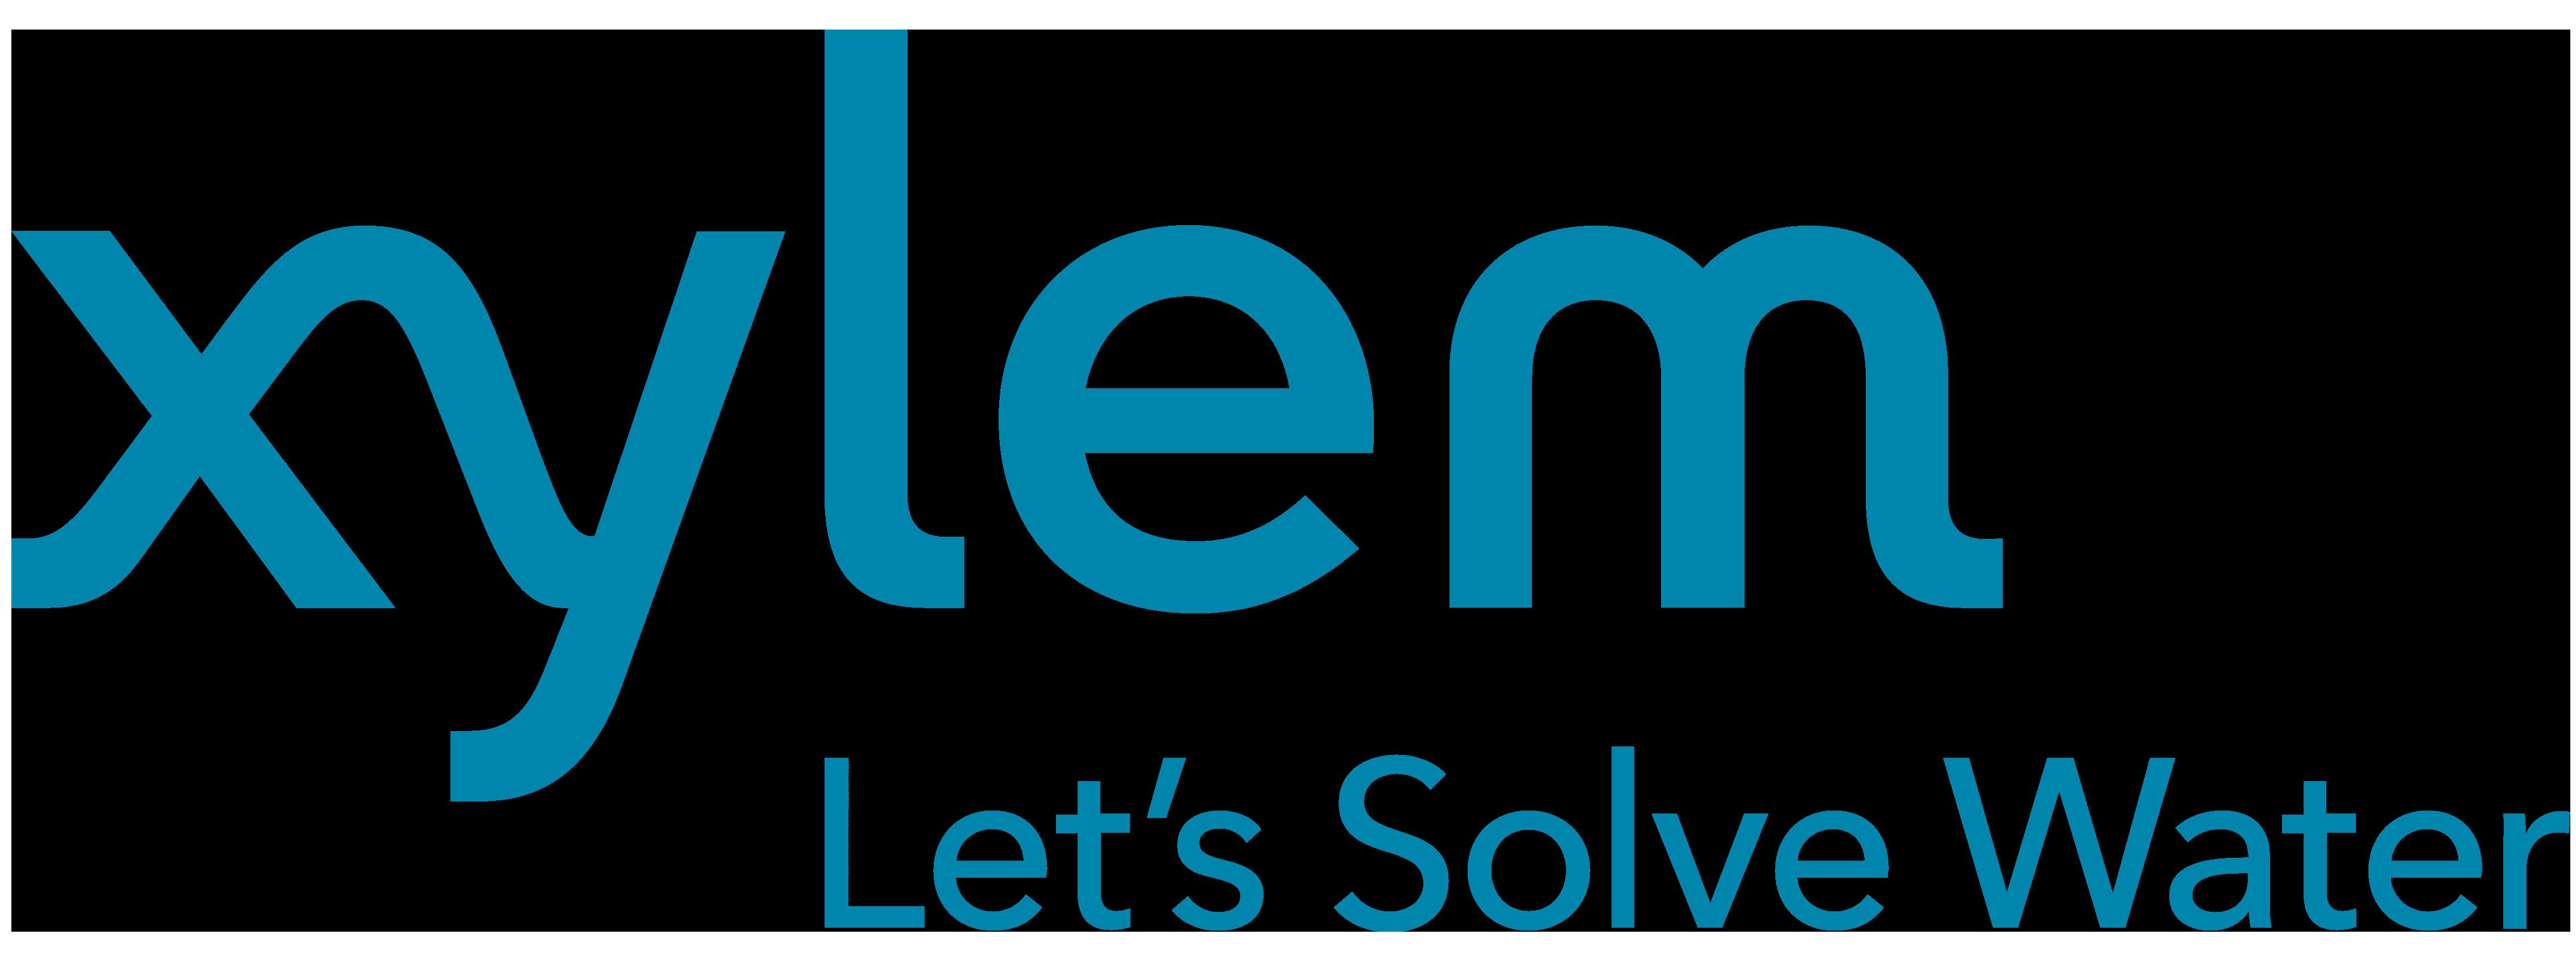 xylem logos download Auburn Logo Outline Auburn Logo Clip Art